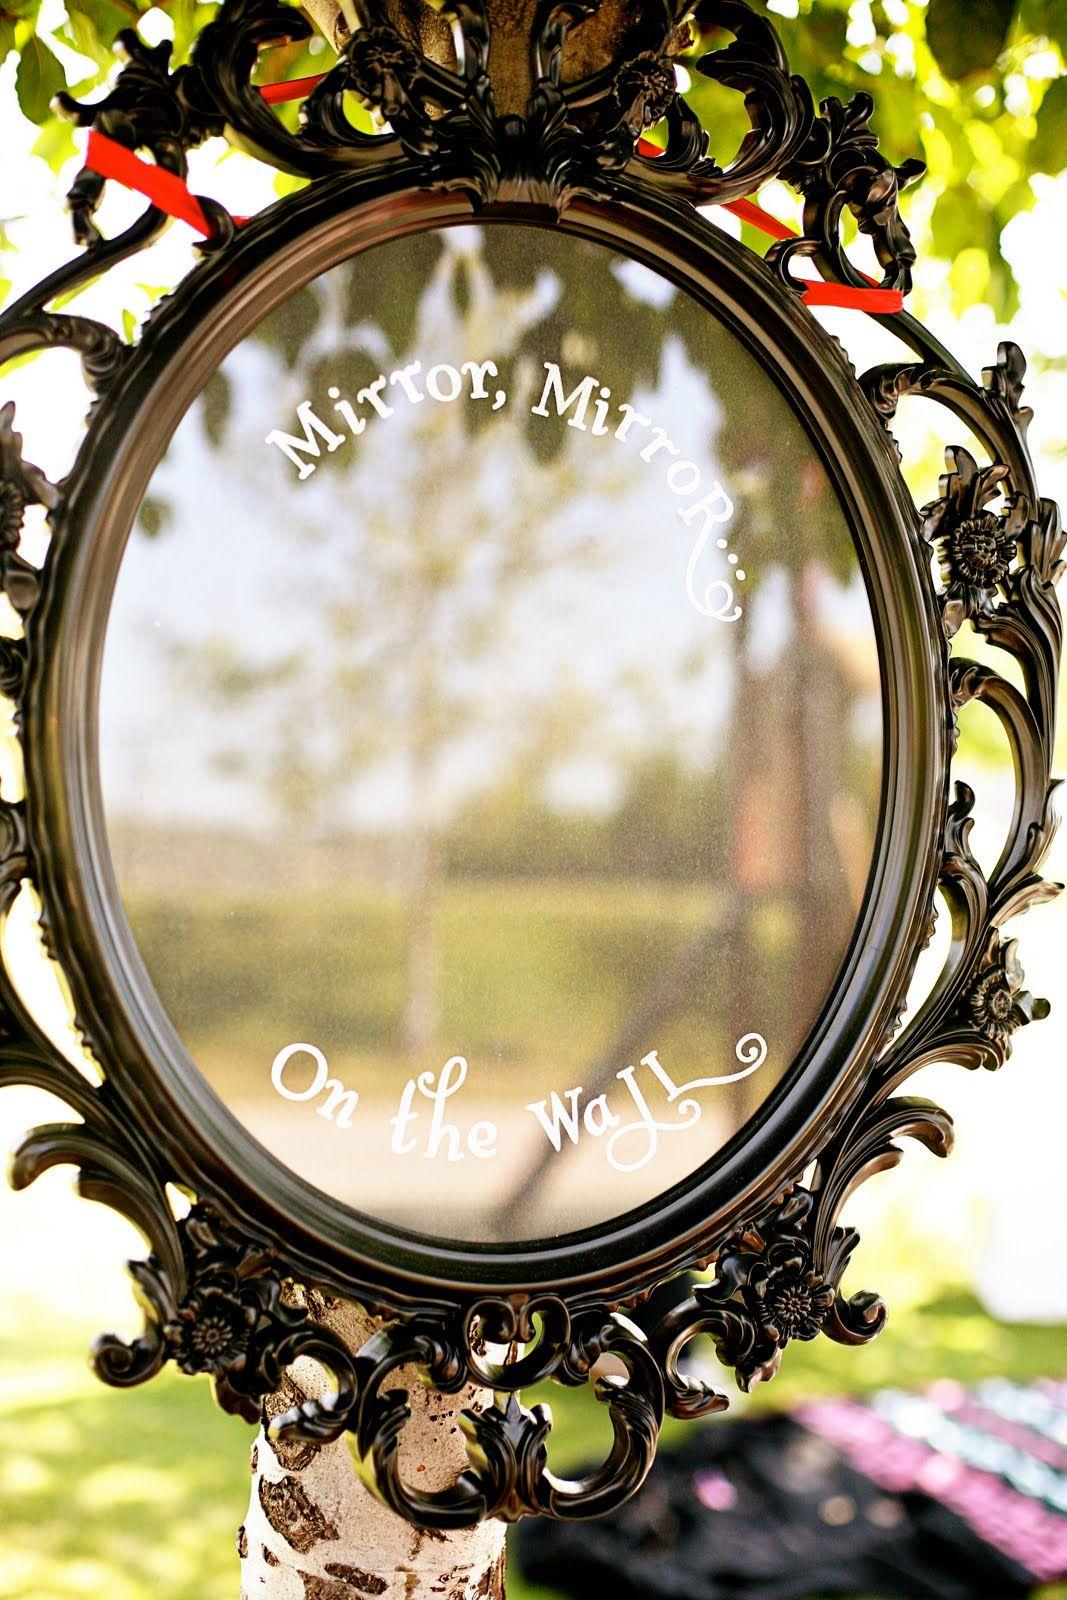 Hi ho hi ho lydias 3rd birthday we go mirror mirror on diy magic mirror for snow white party amipublicfo Choice Image